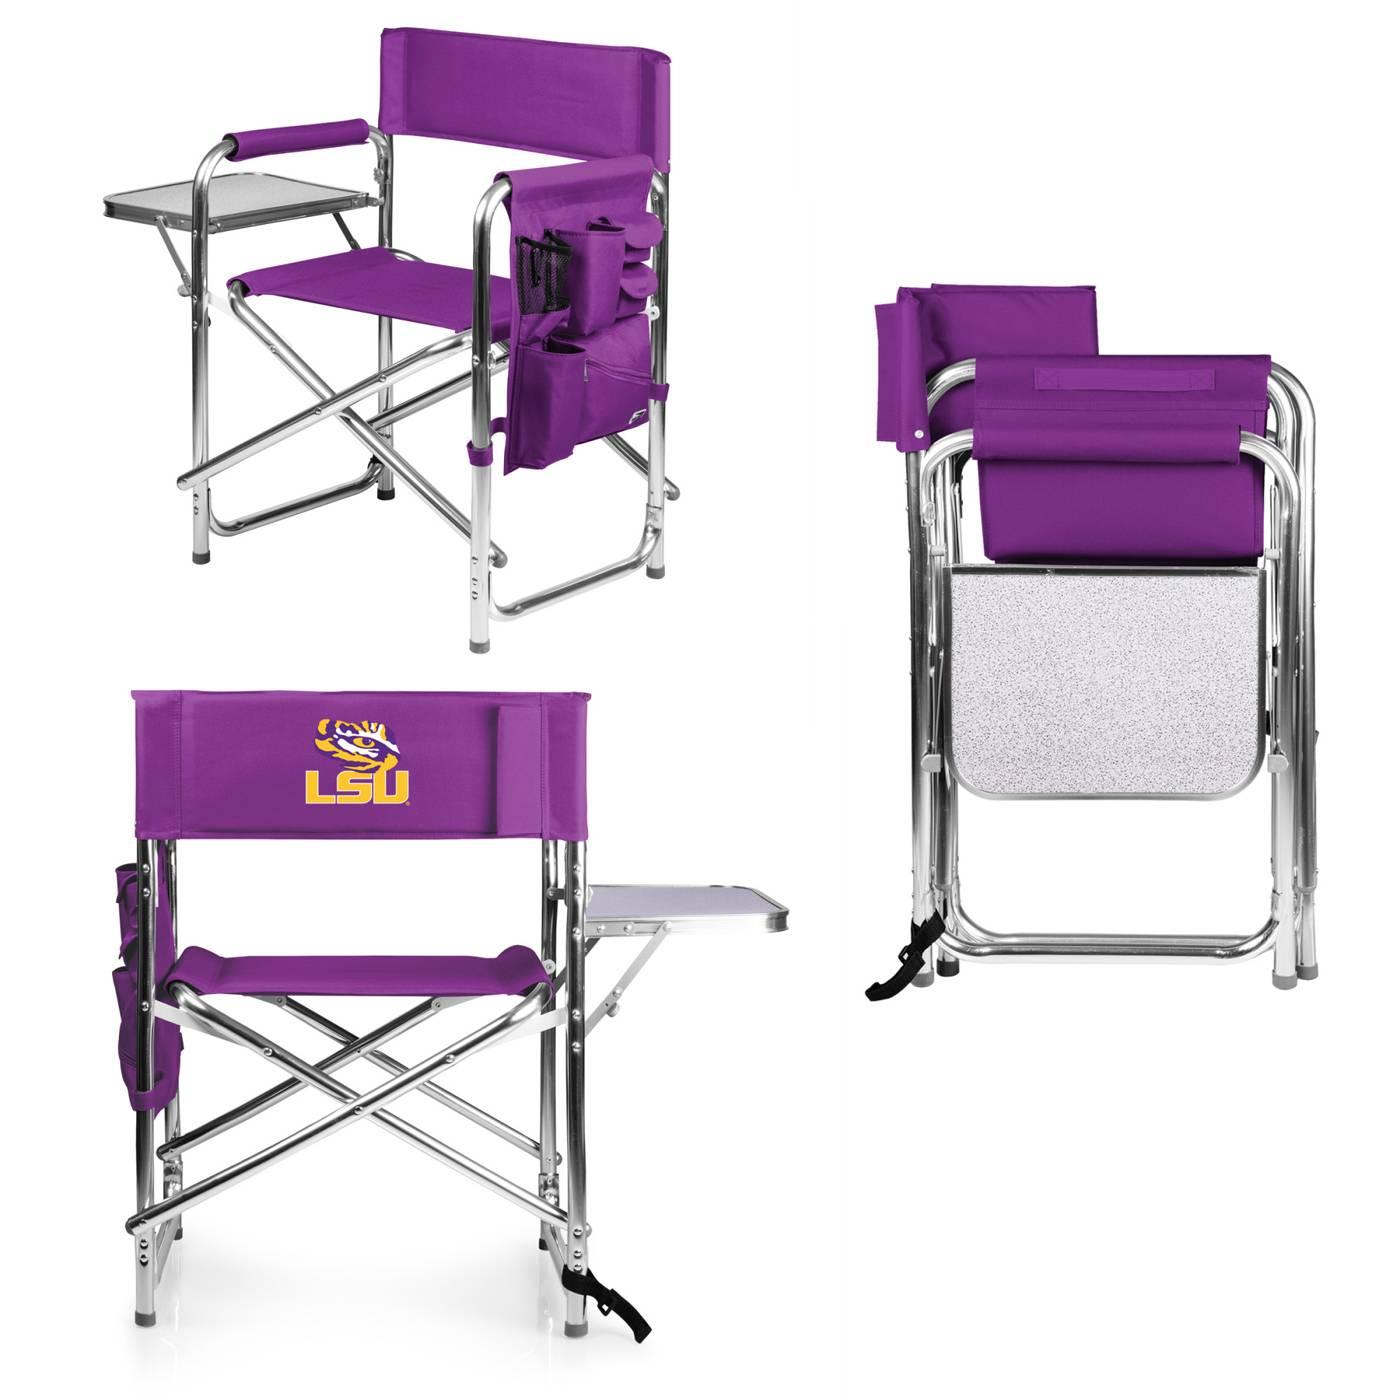 ... Lsu Folding Chairs By Lsu Tigers Purple Sports Folding Chair ...